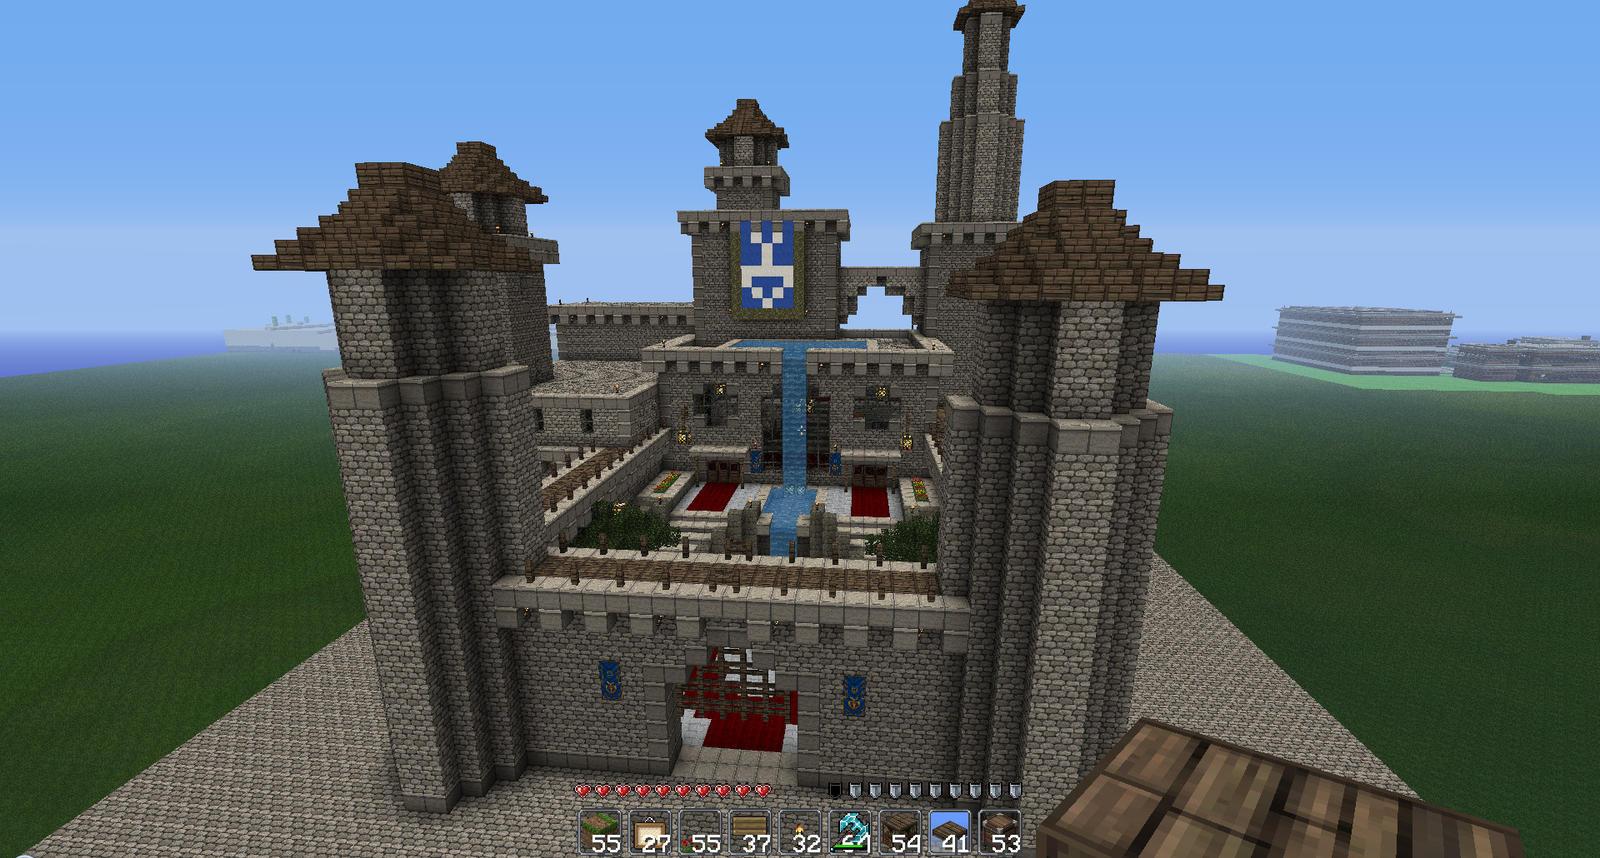 Minecraft Medieval Castle by oddworld90